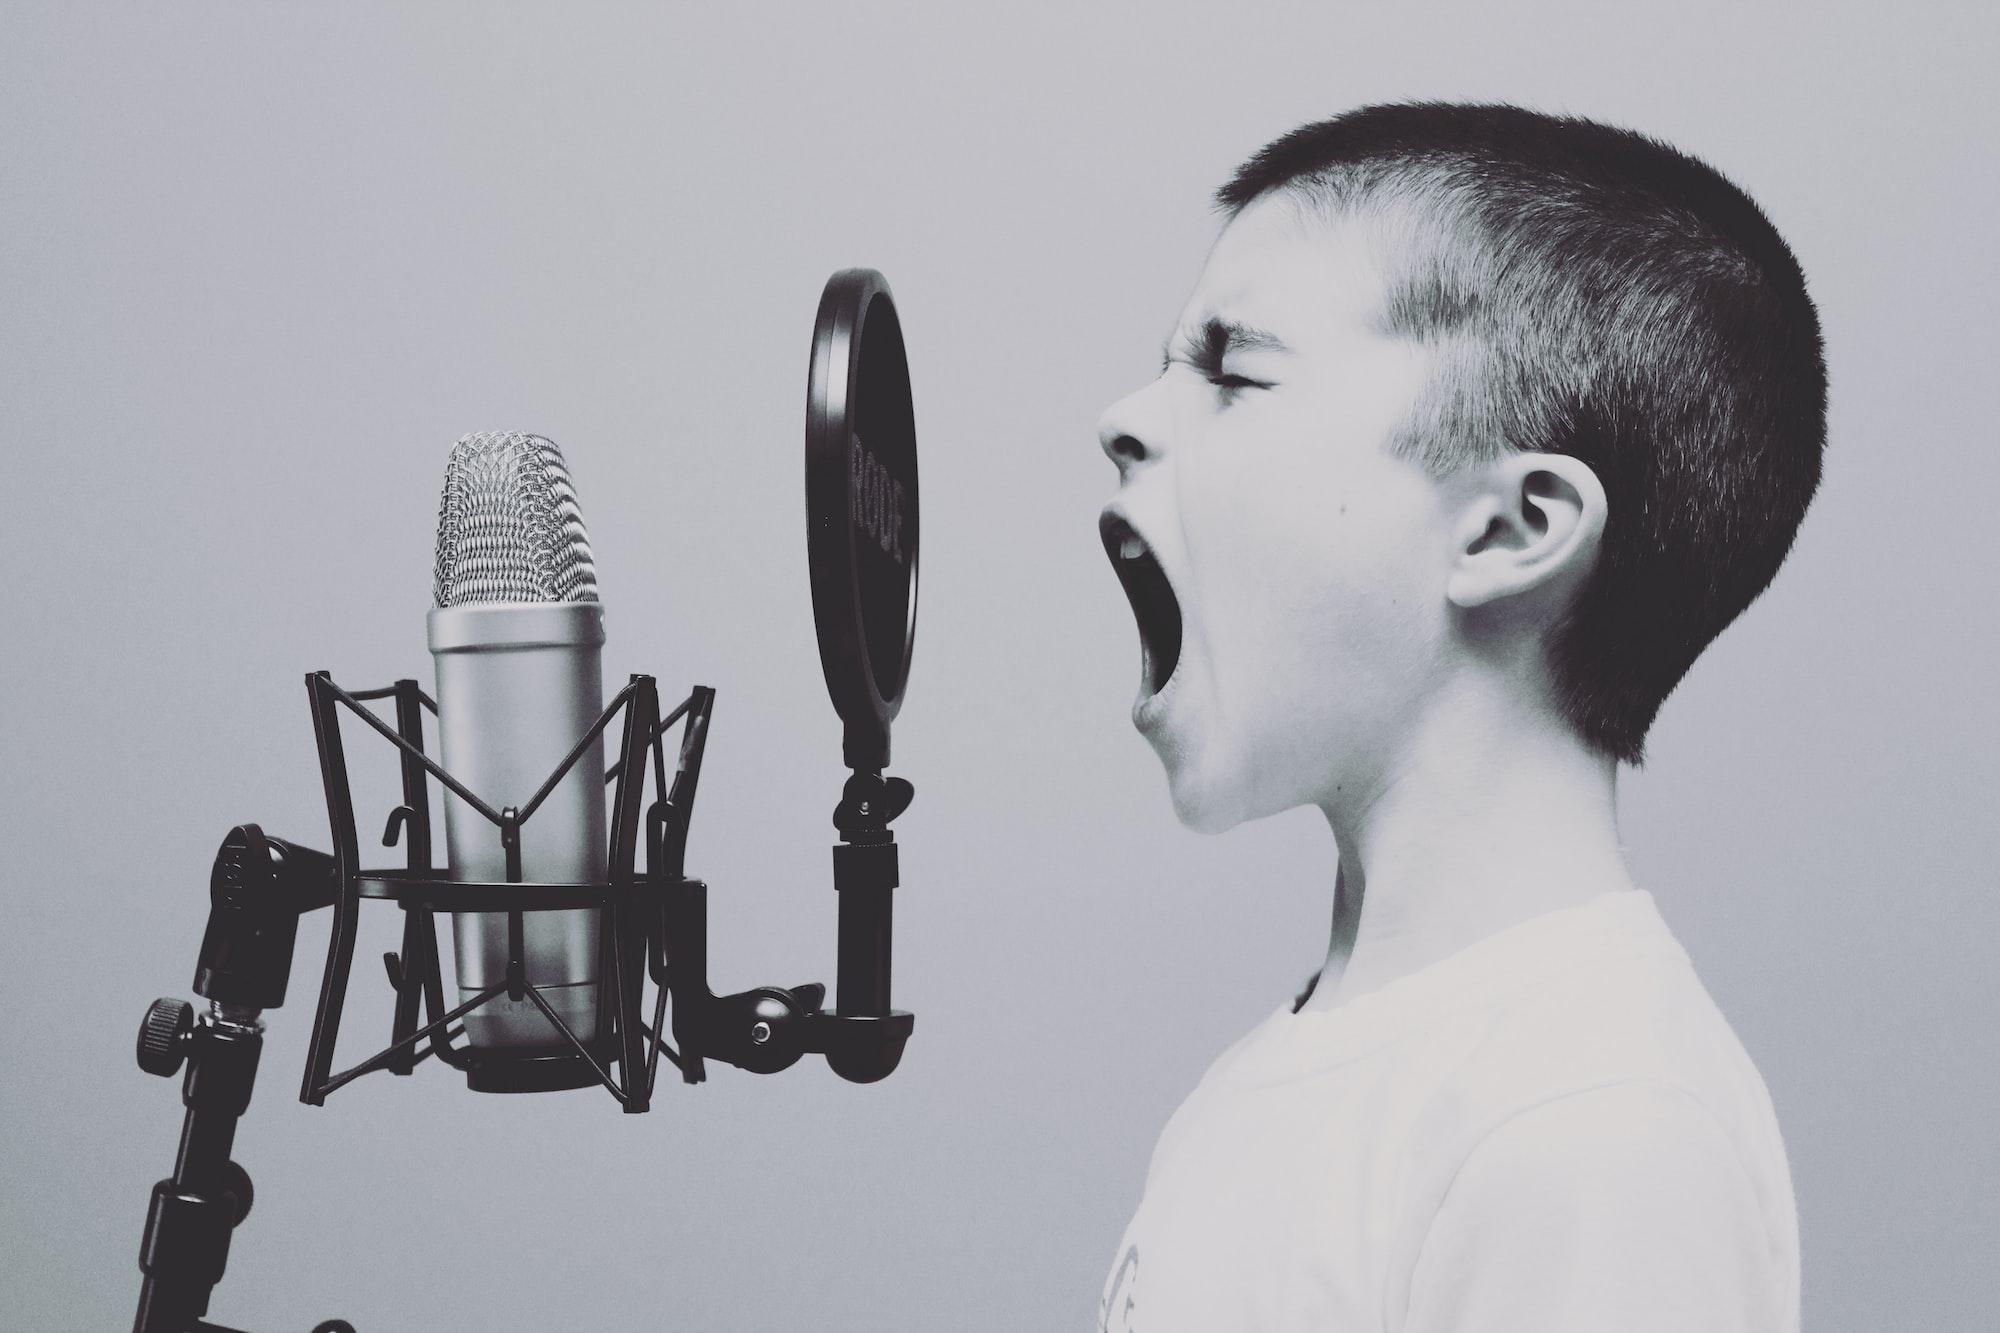 The Role of Communication in DevOps